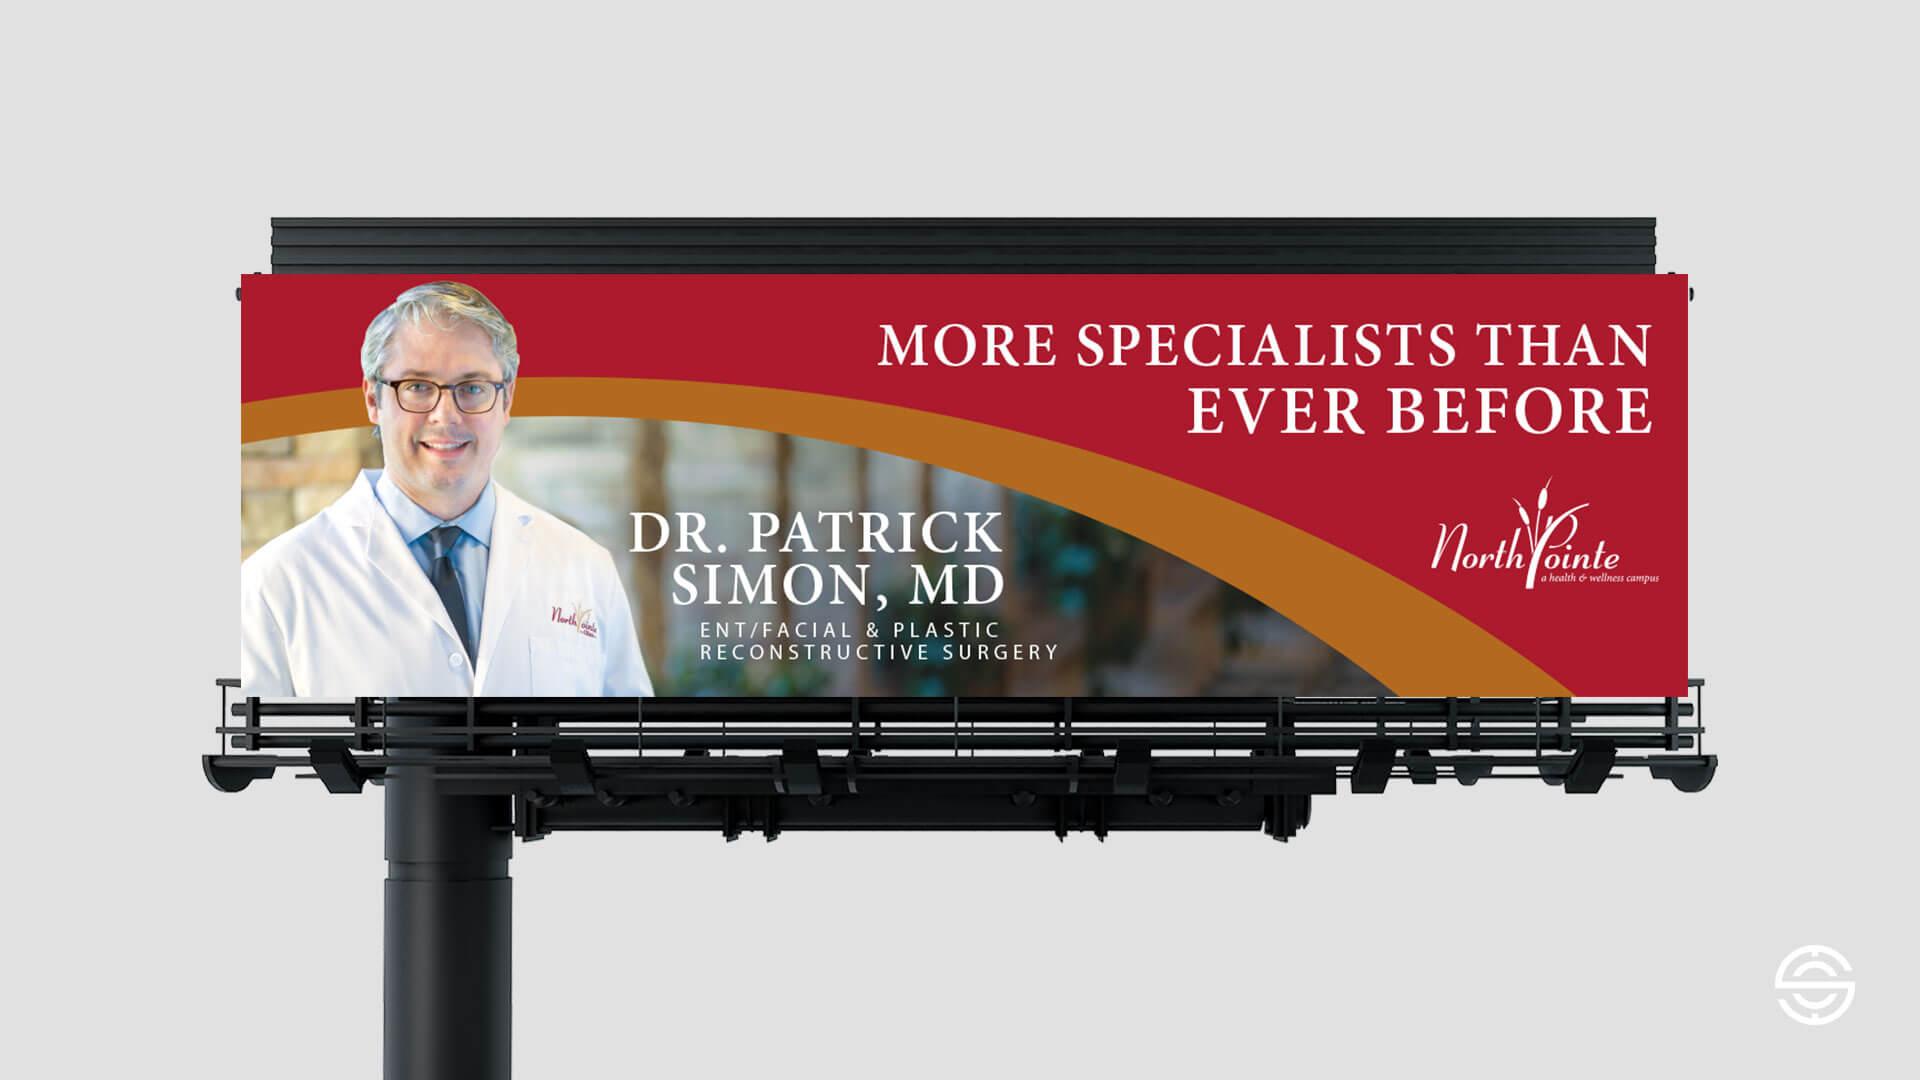 Dr. Patrick Simon Billboard